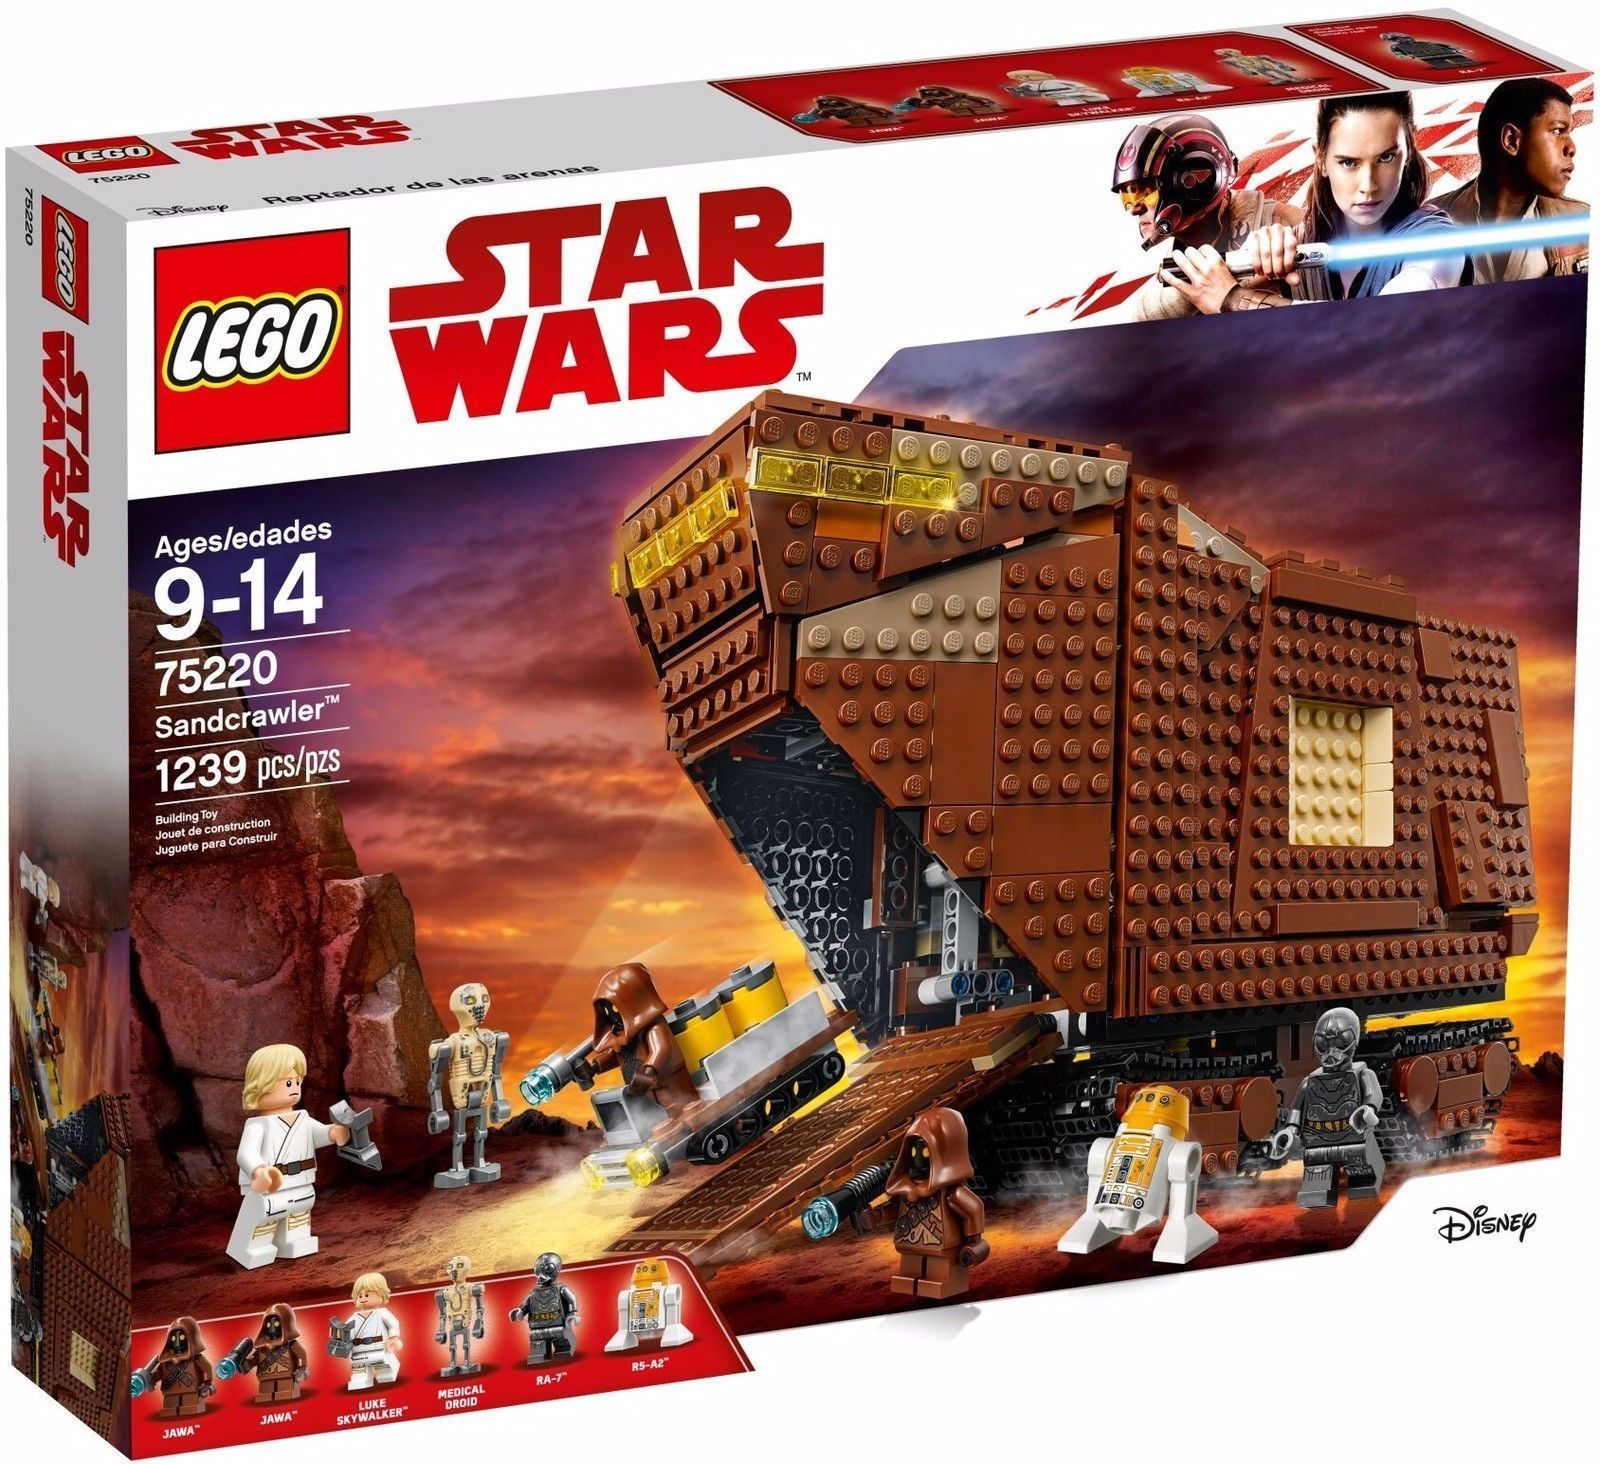 LEGO Star Wars 75220 Jawa Sandcrawler Building Set [NEW]